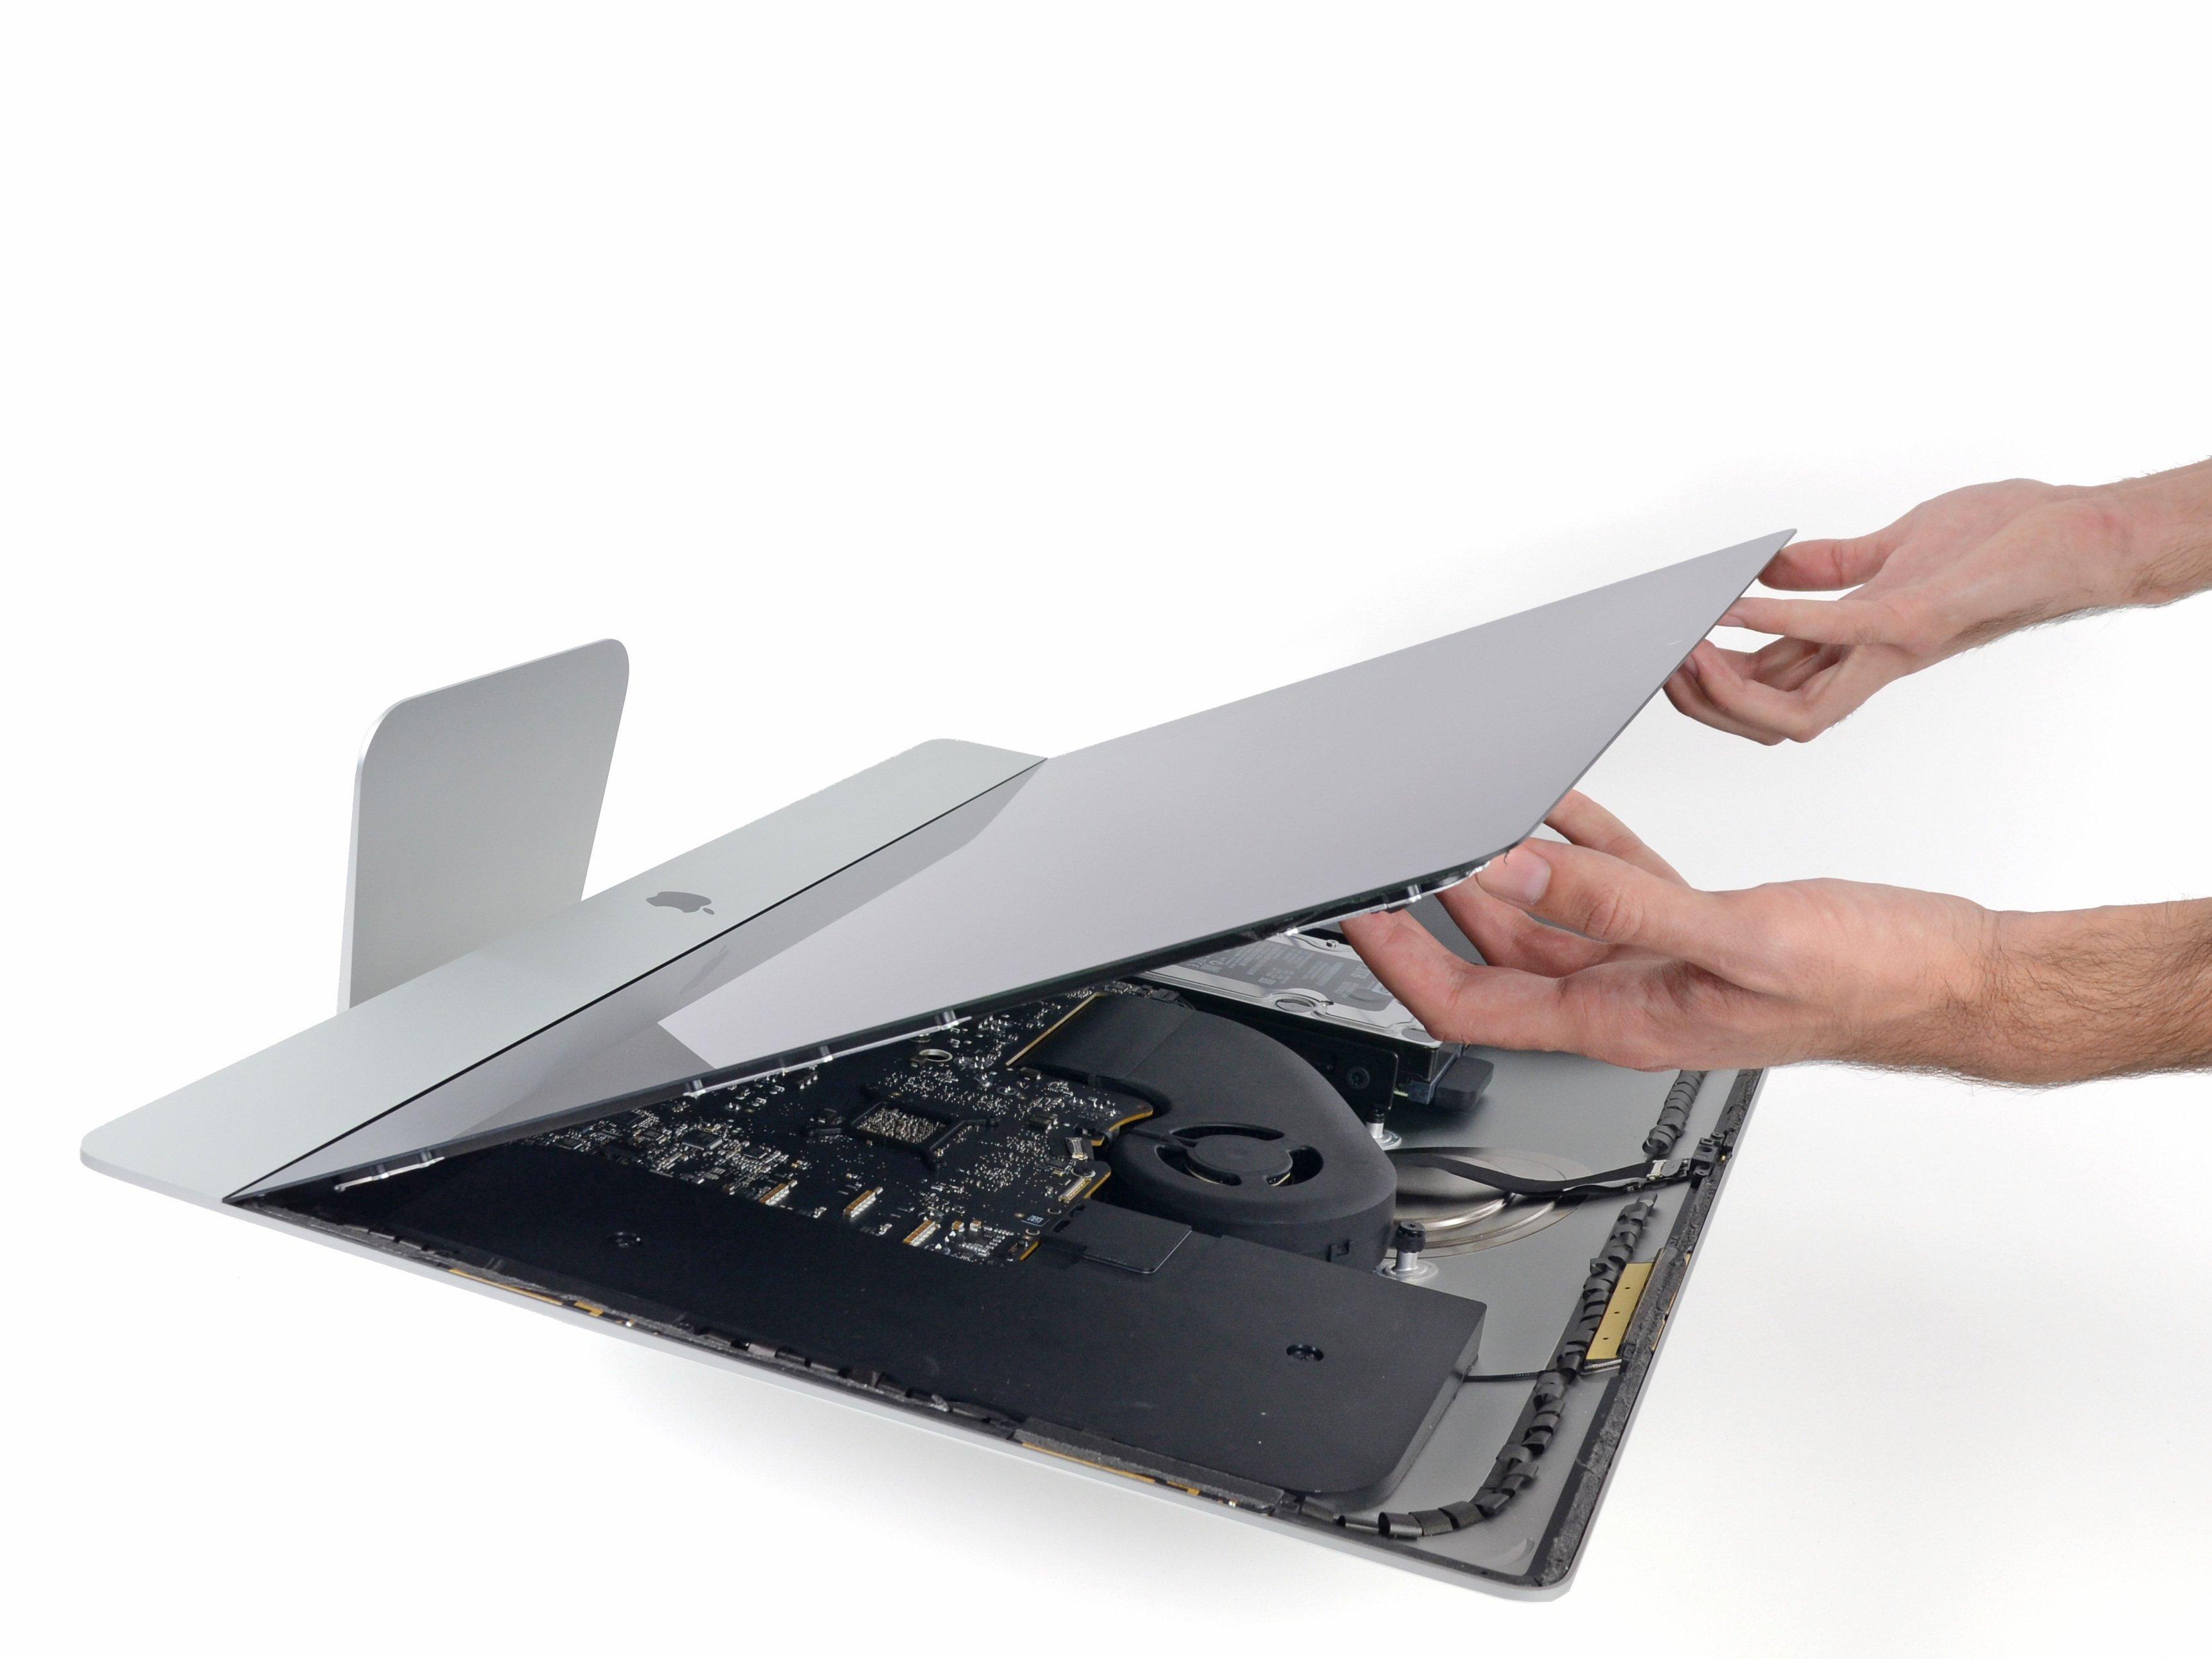 iMac Intel 27